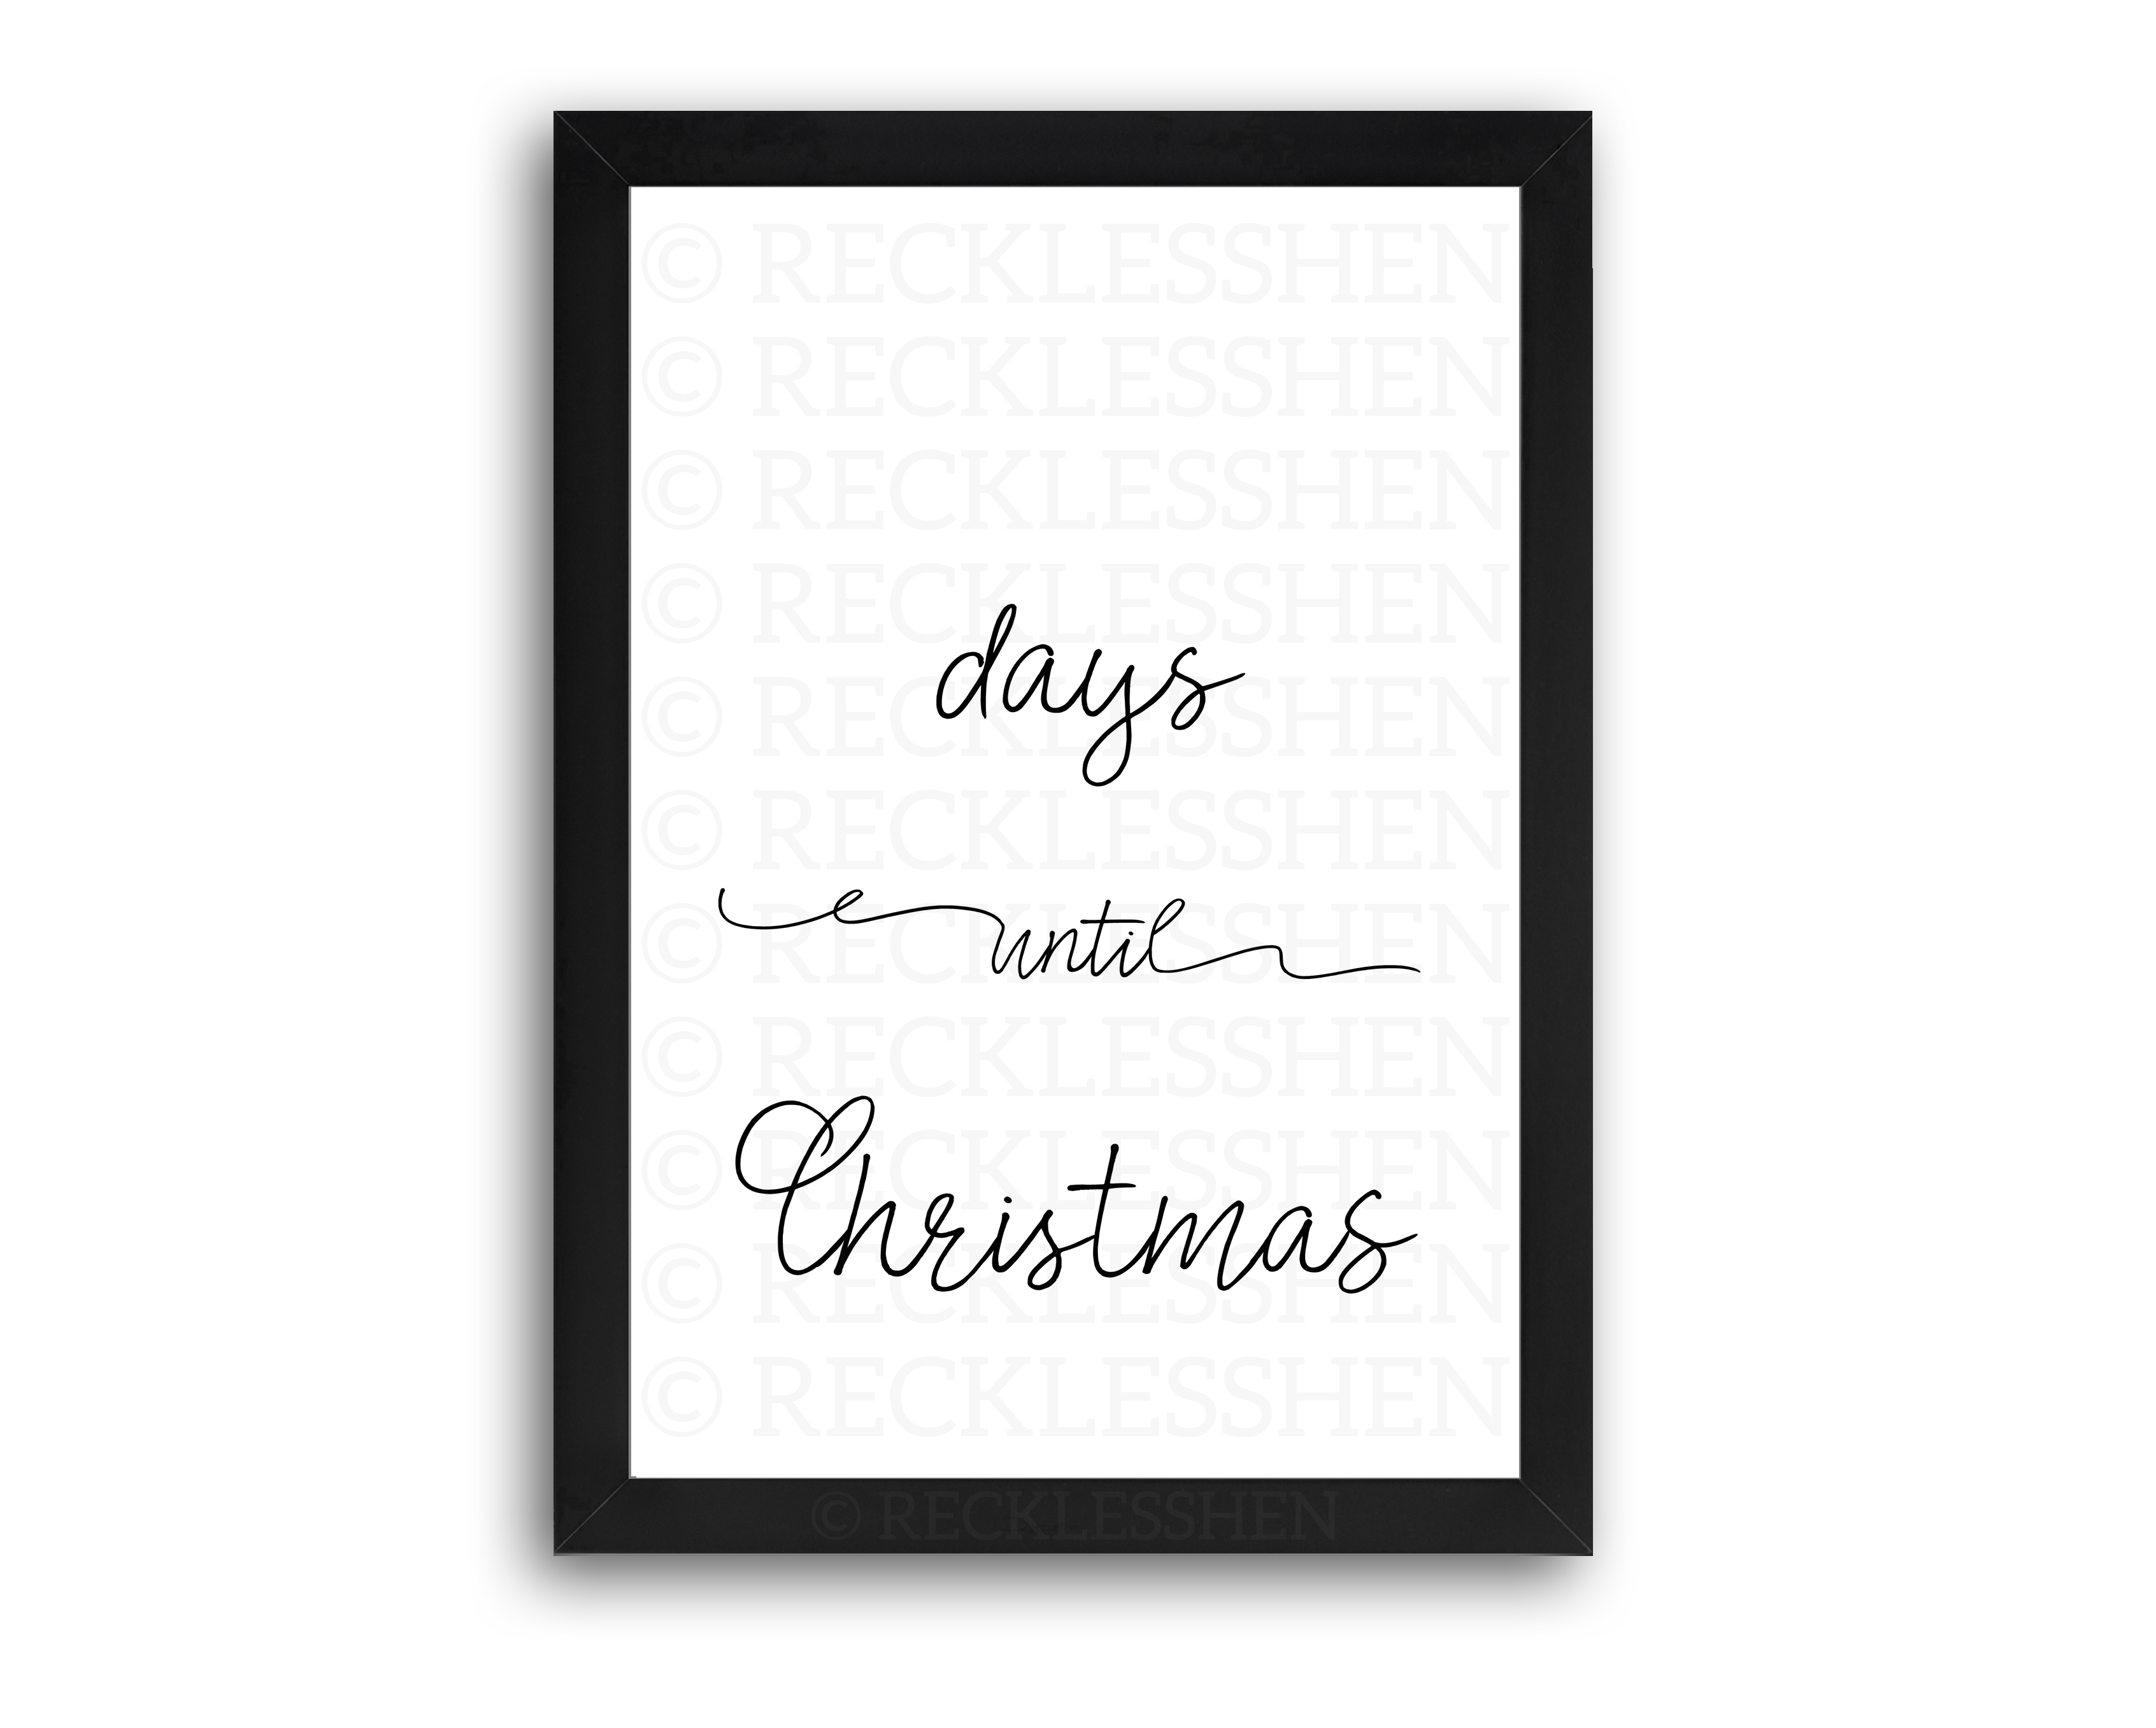 Days Until Christmas - A4 Print